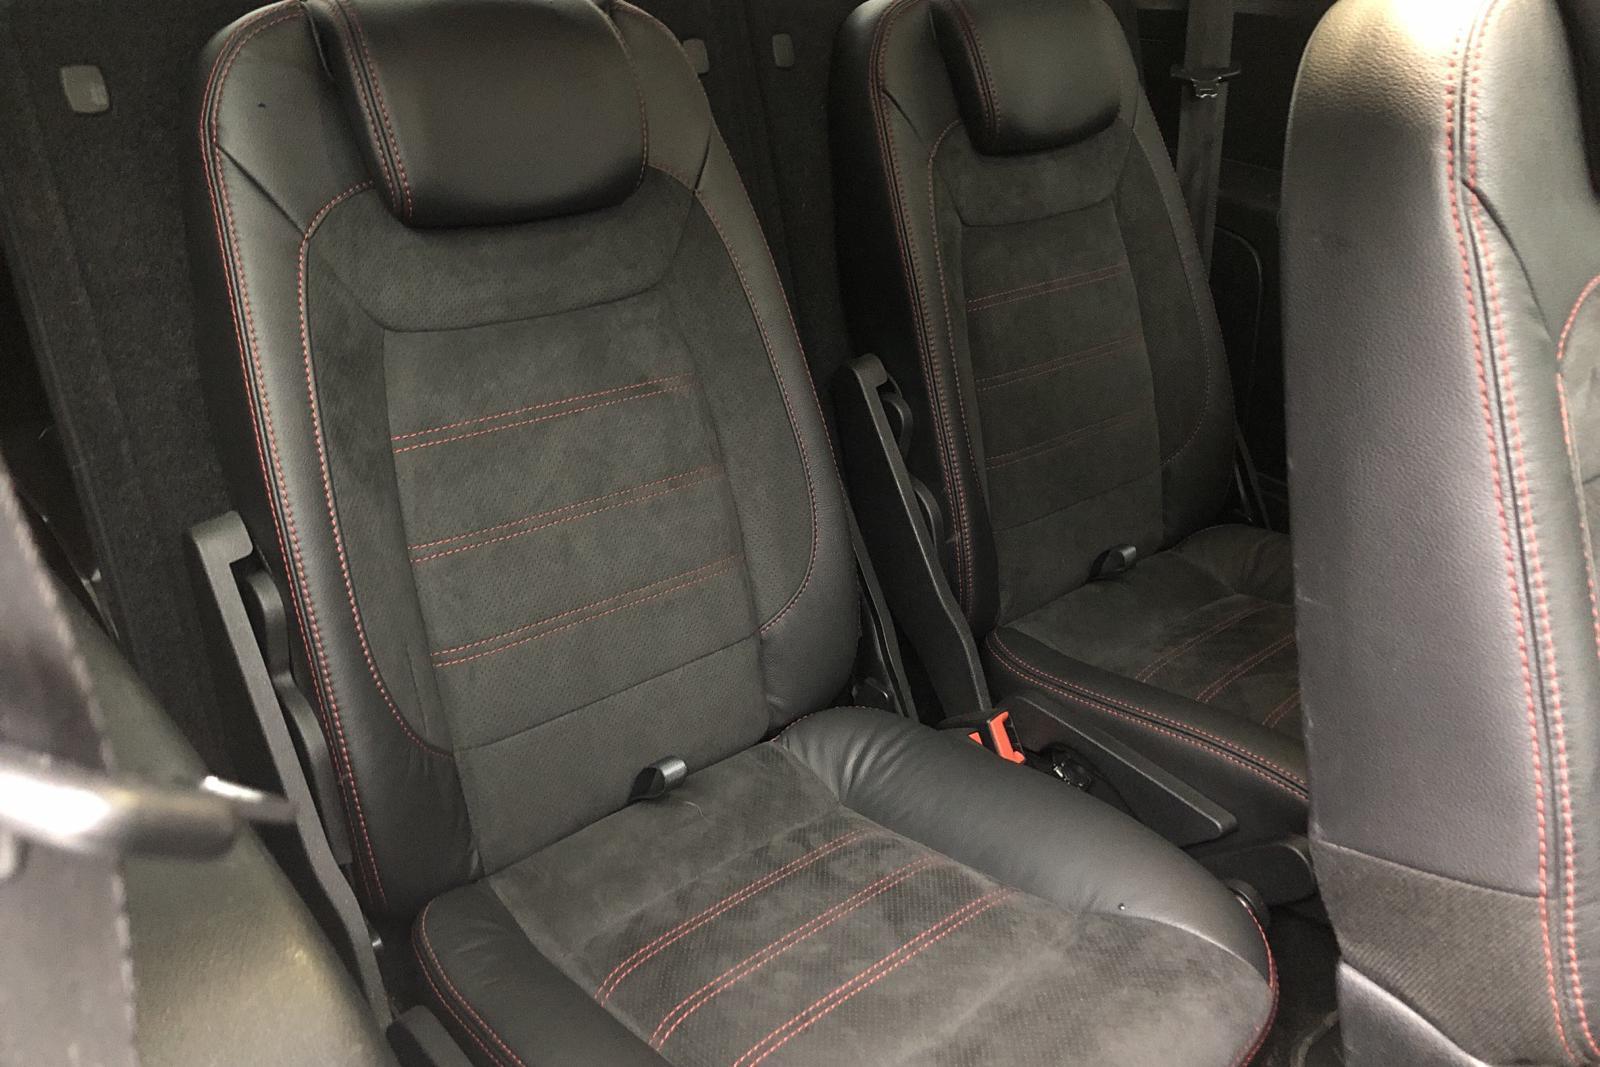 Ford S-MAX 2.2 Duratorq TDCi (200hk) - 161 260 km - Automatic - white - 2012